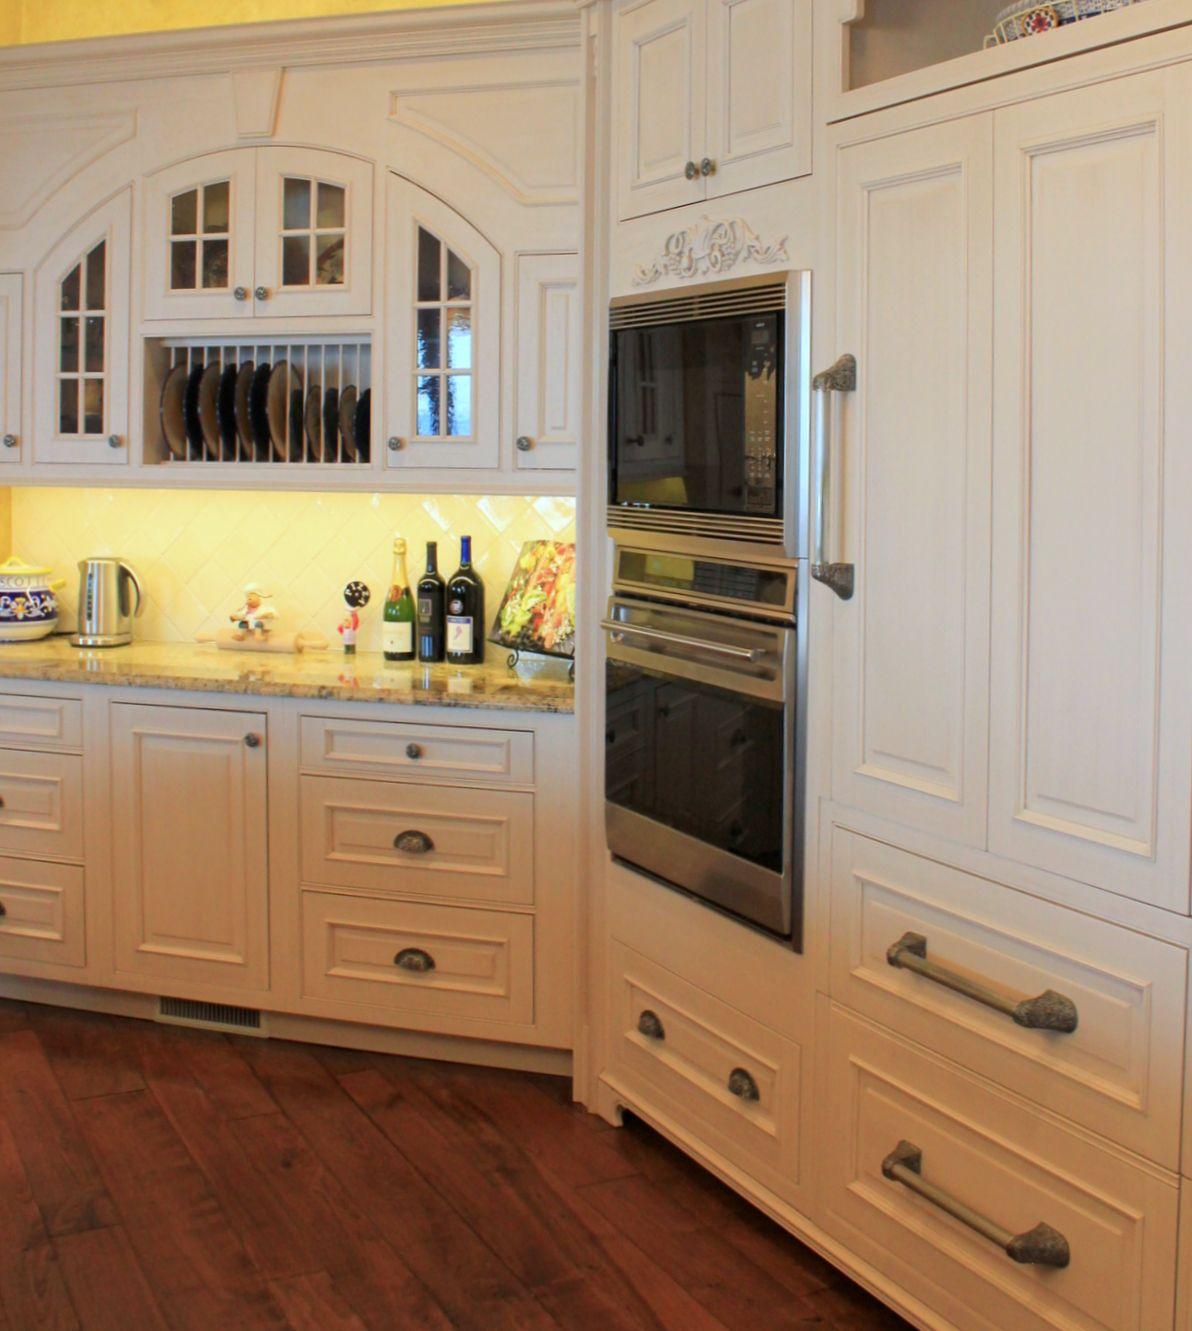 Lakehouse Charm Home Kitchens Cabinet Furniture Kitchen Cabinet Hardware